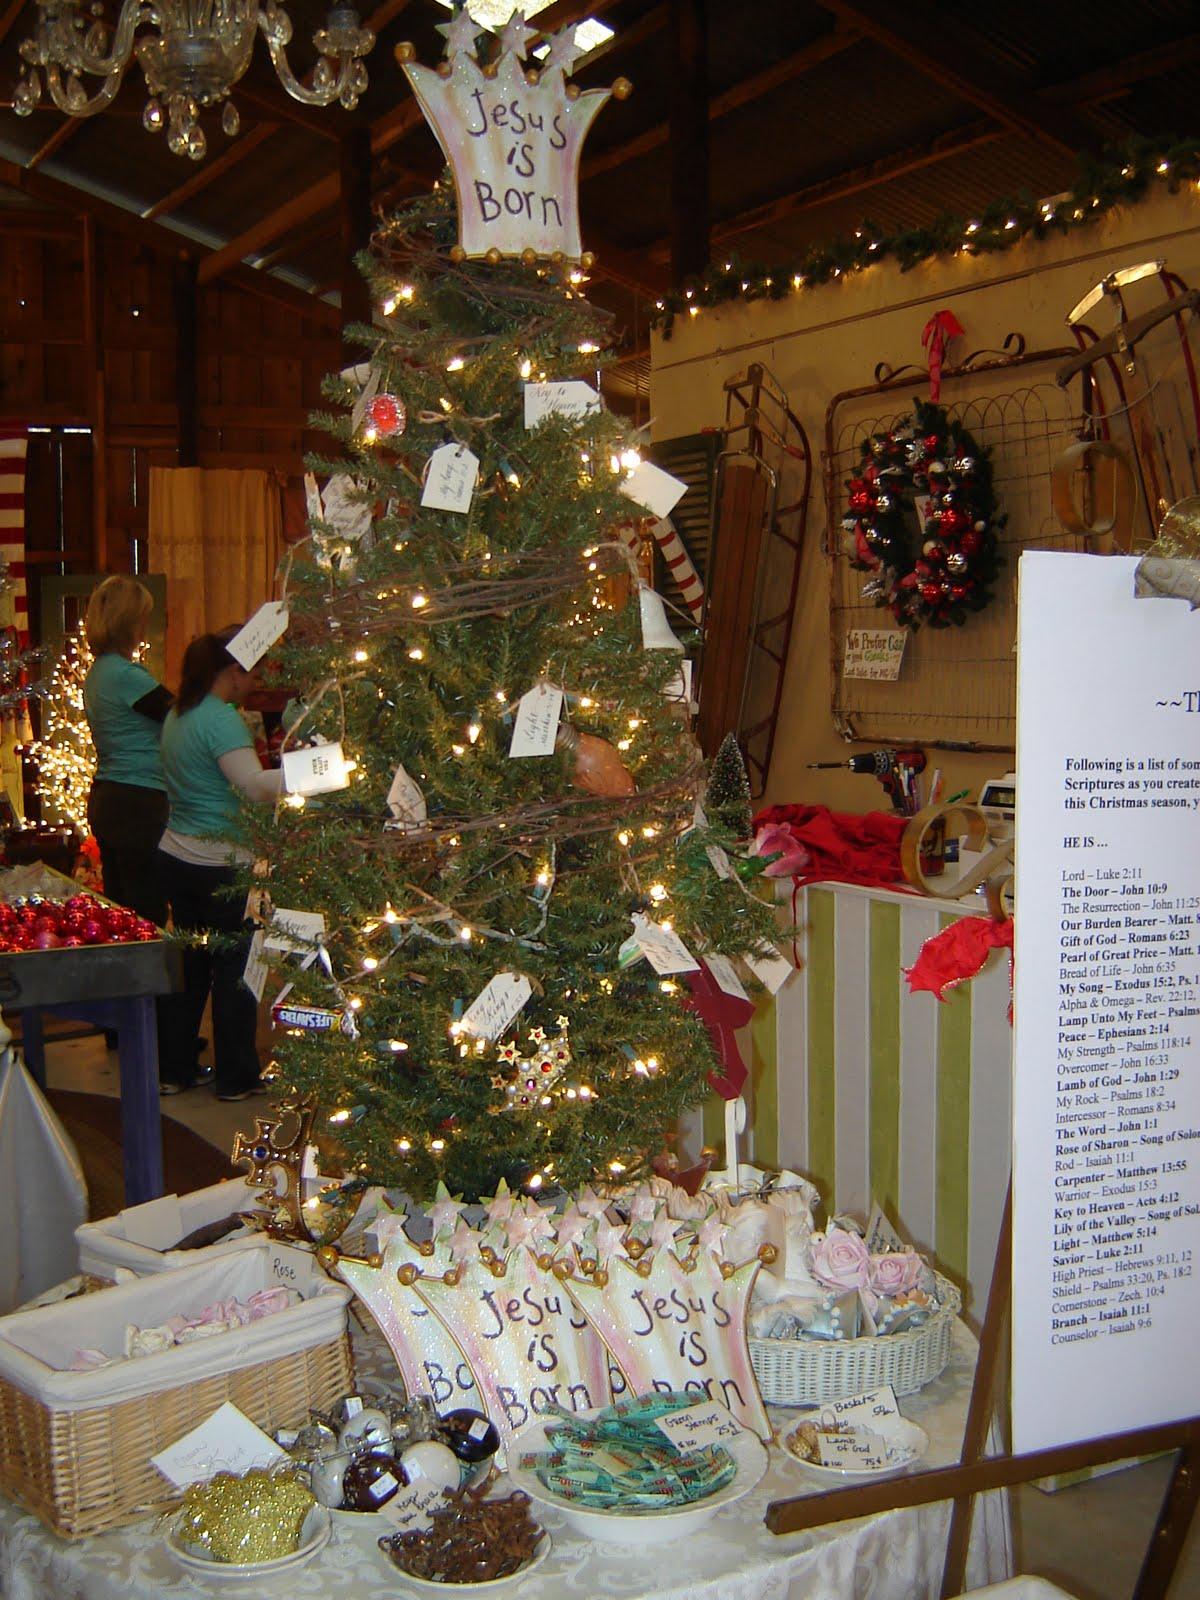 Gresham Barn Sale: The JESUS Tree